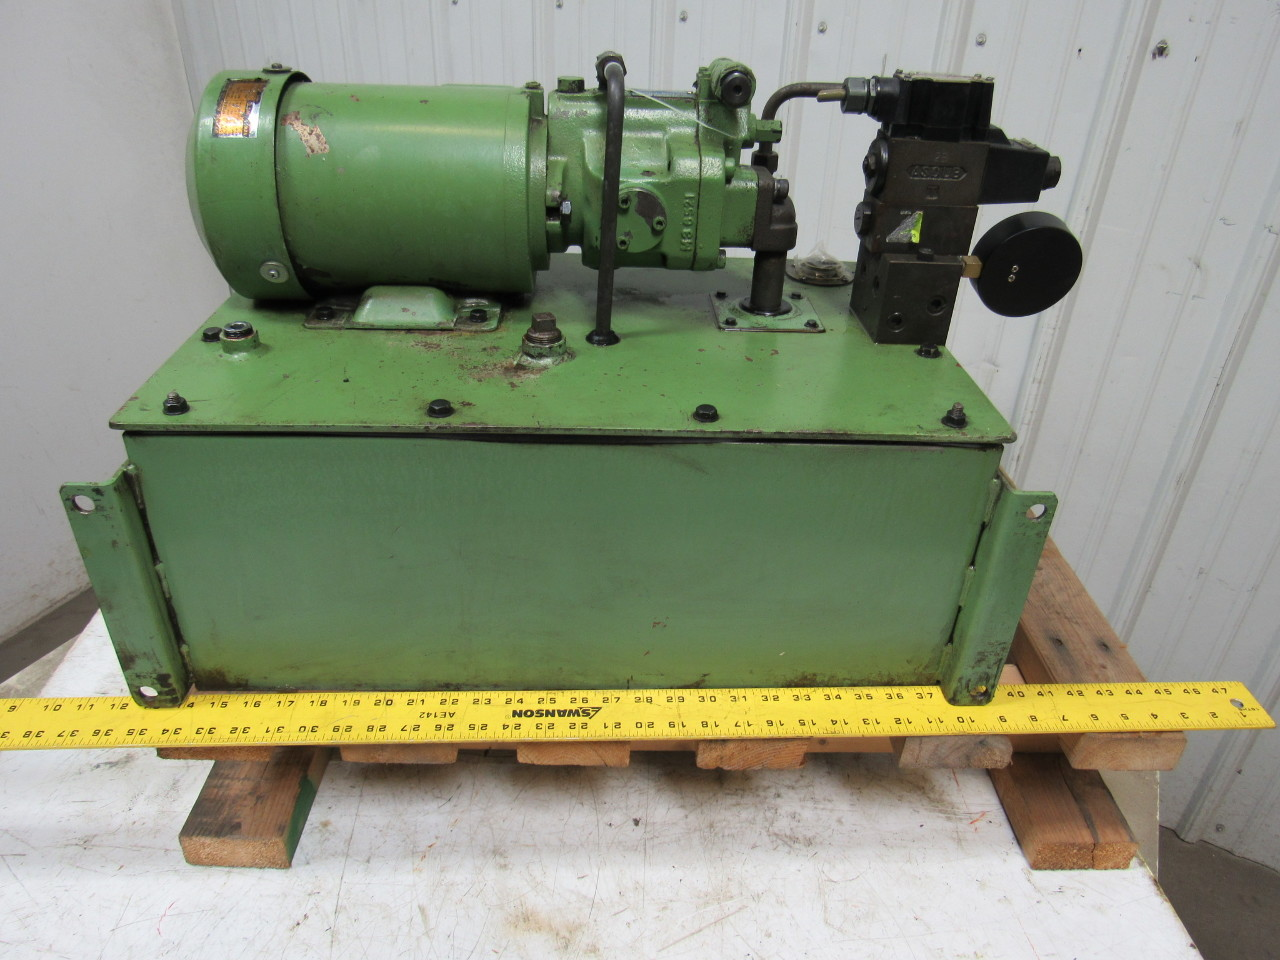 Daikin v15a1ry 85 hydraulic pump w 12 gallon tank 220v for How to size a hydraulic pump and motor